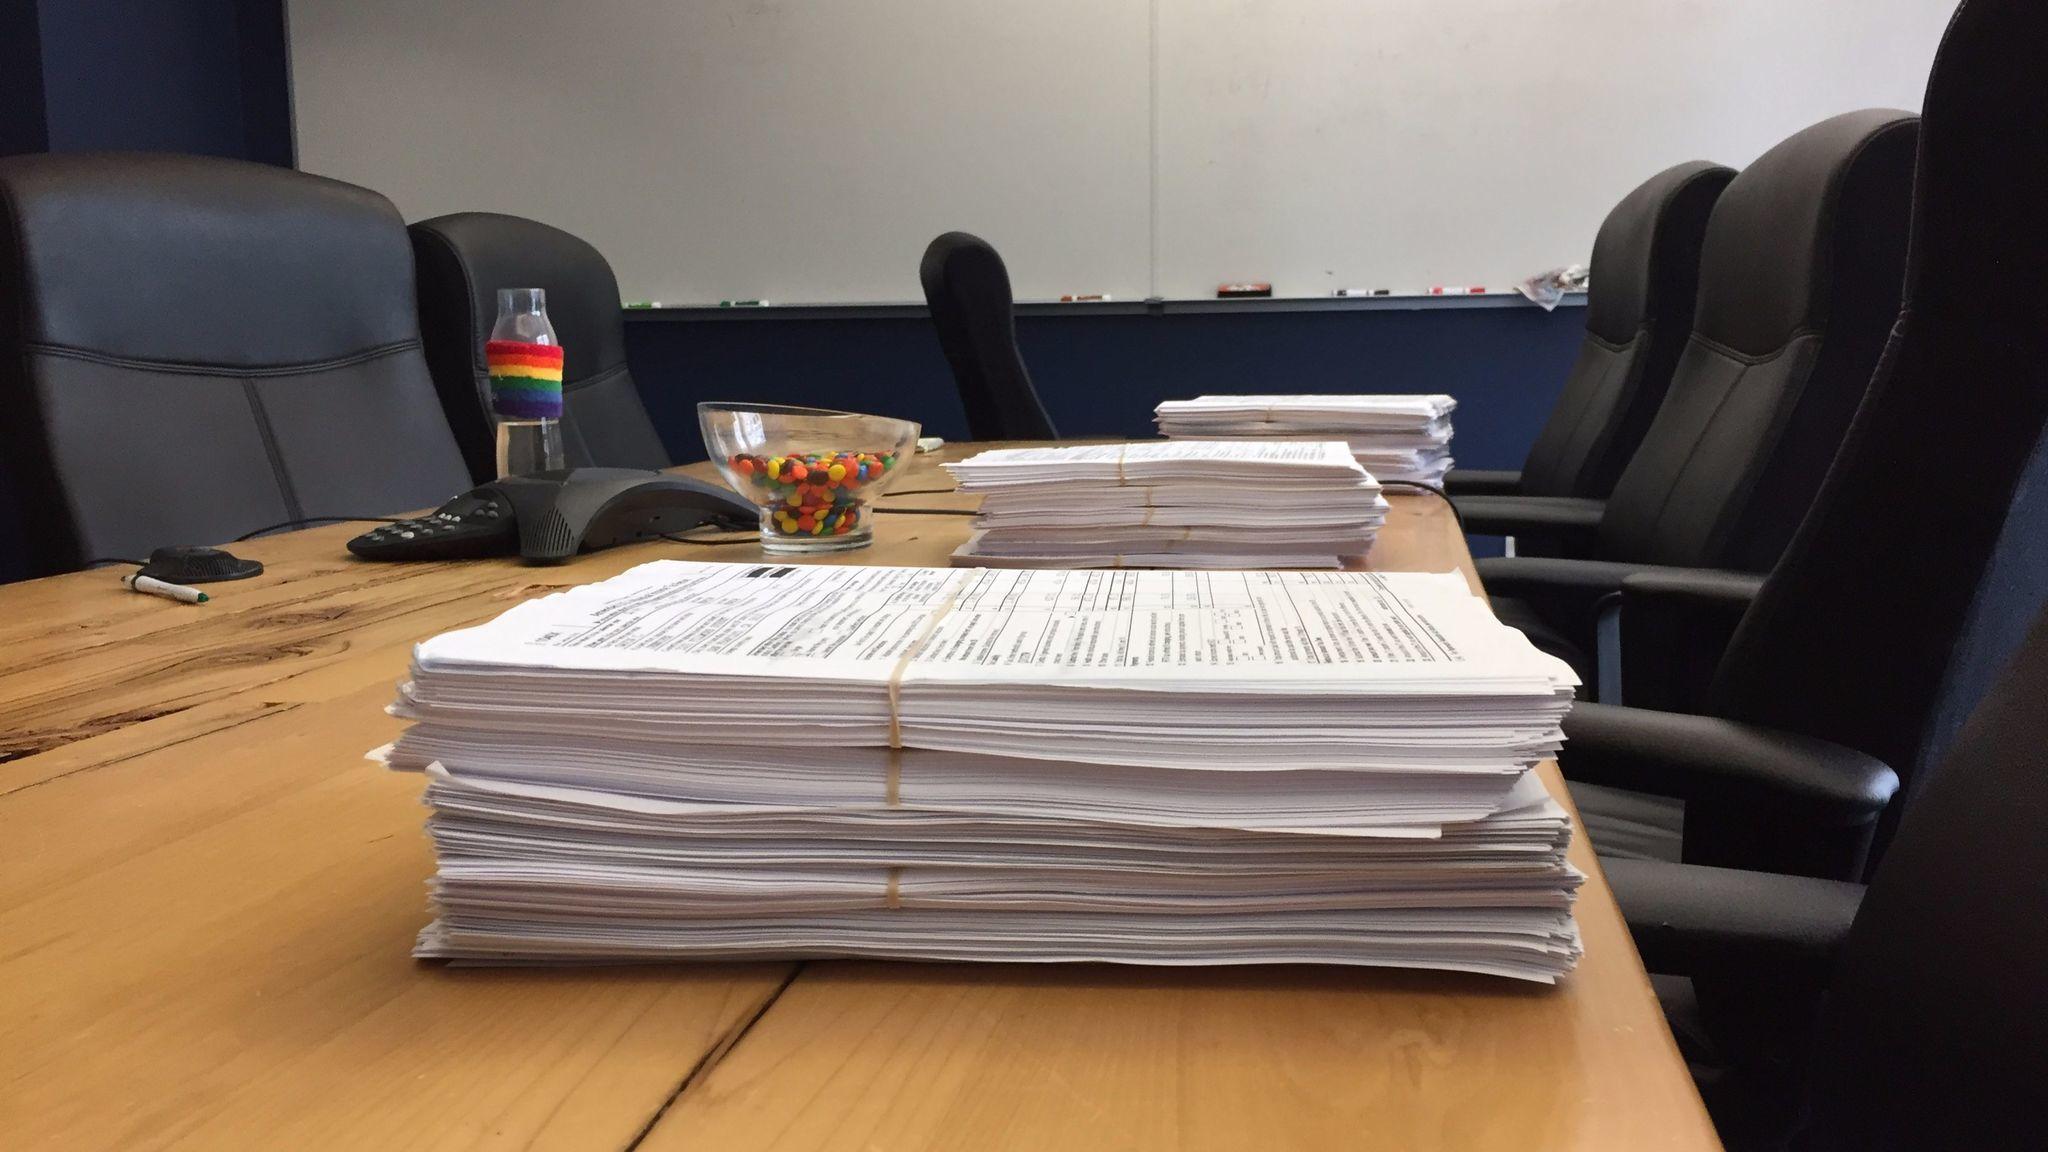 Six years of Lt. Gov. Gavin Newsom's tax returns, from 2010 to 2015.